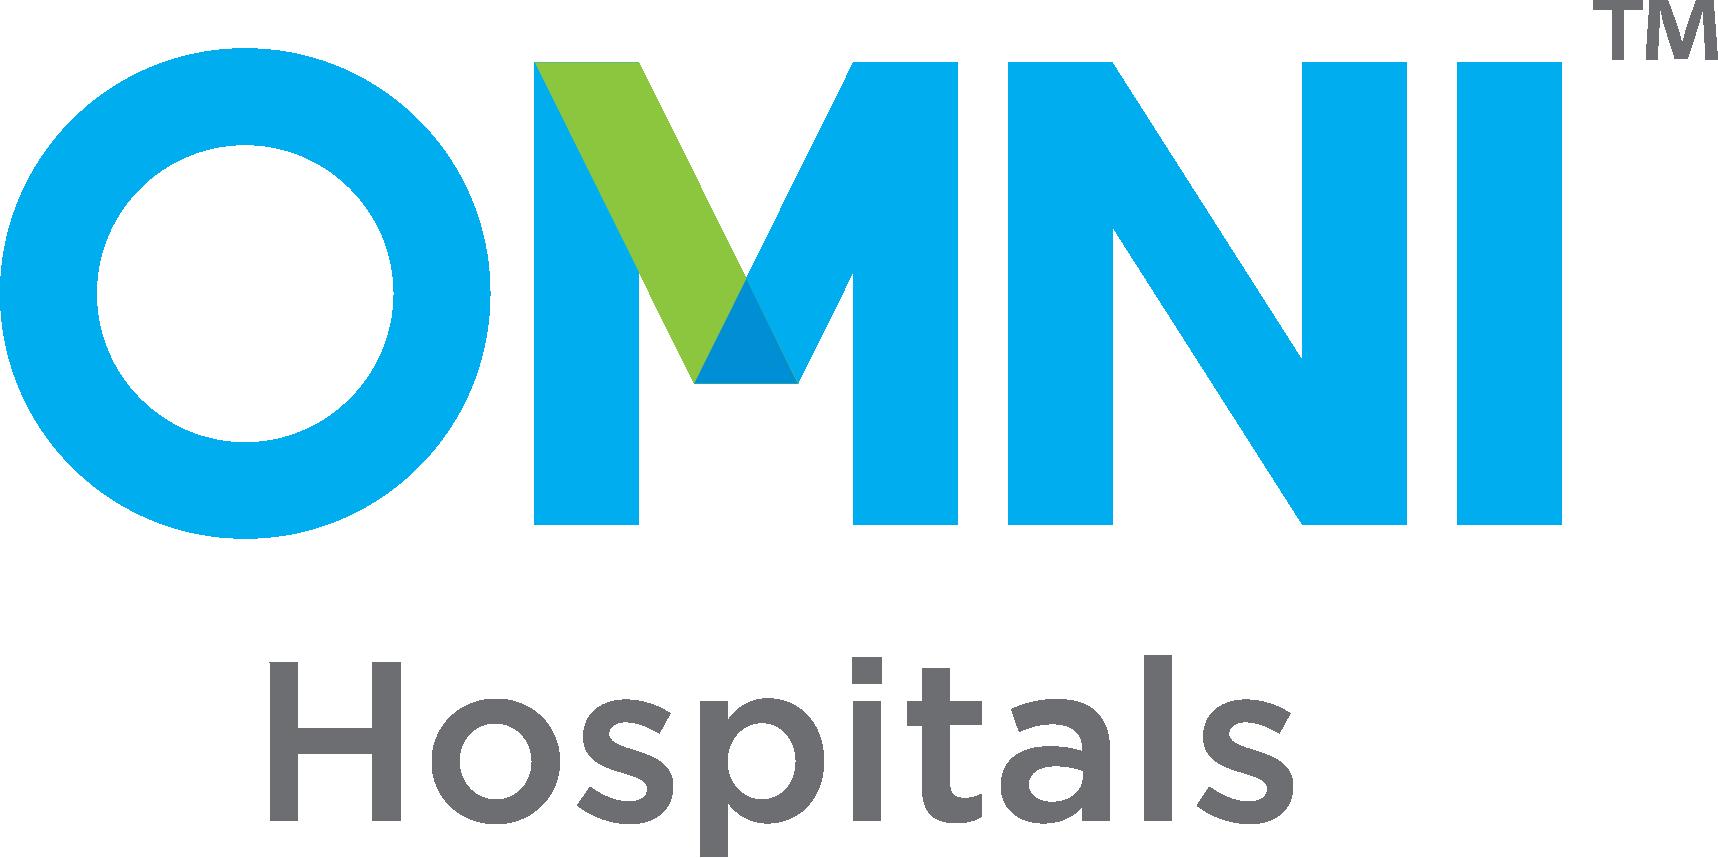 OMNI hospitals logo